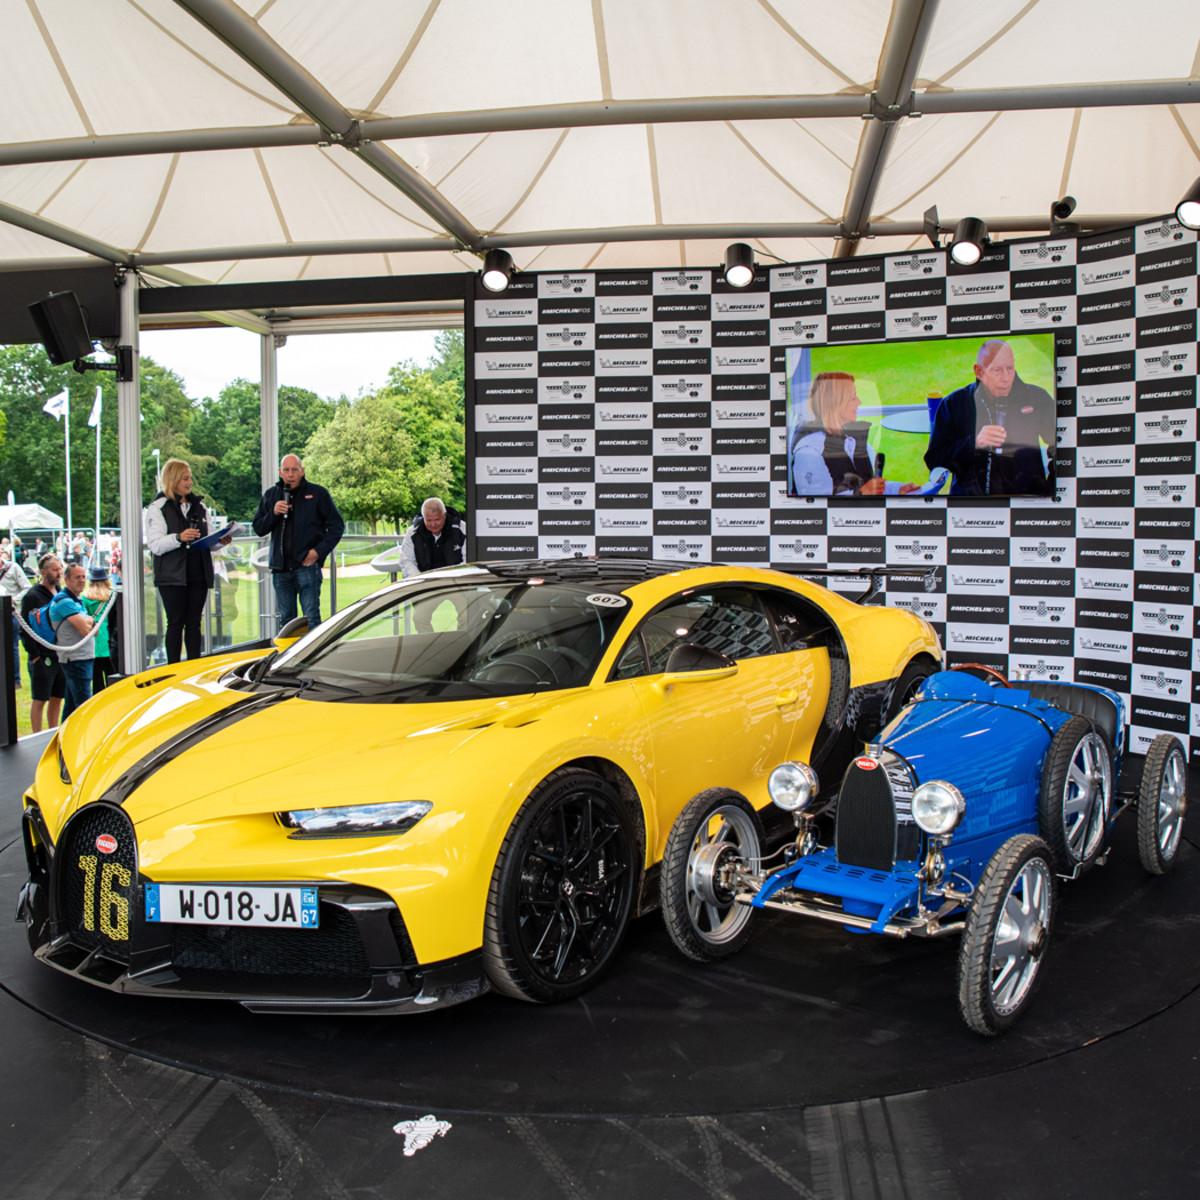 Big and little Bugattis